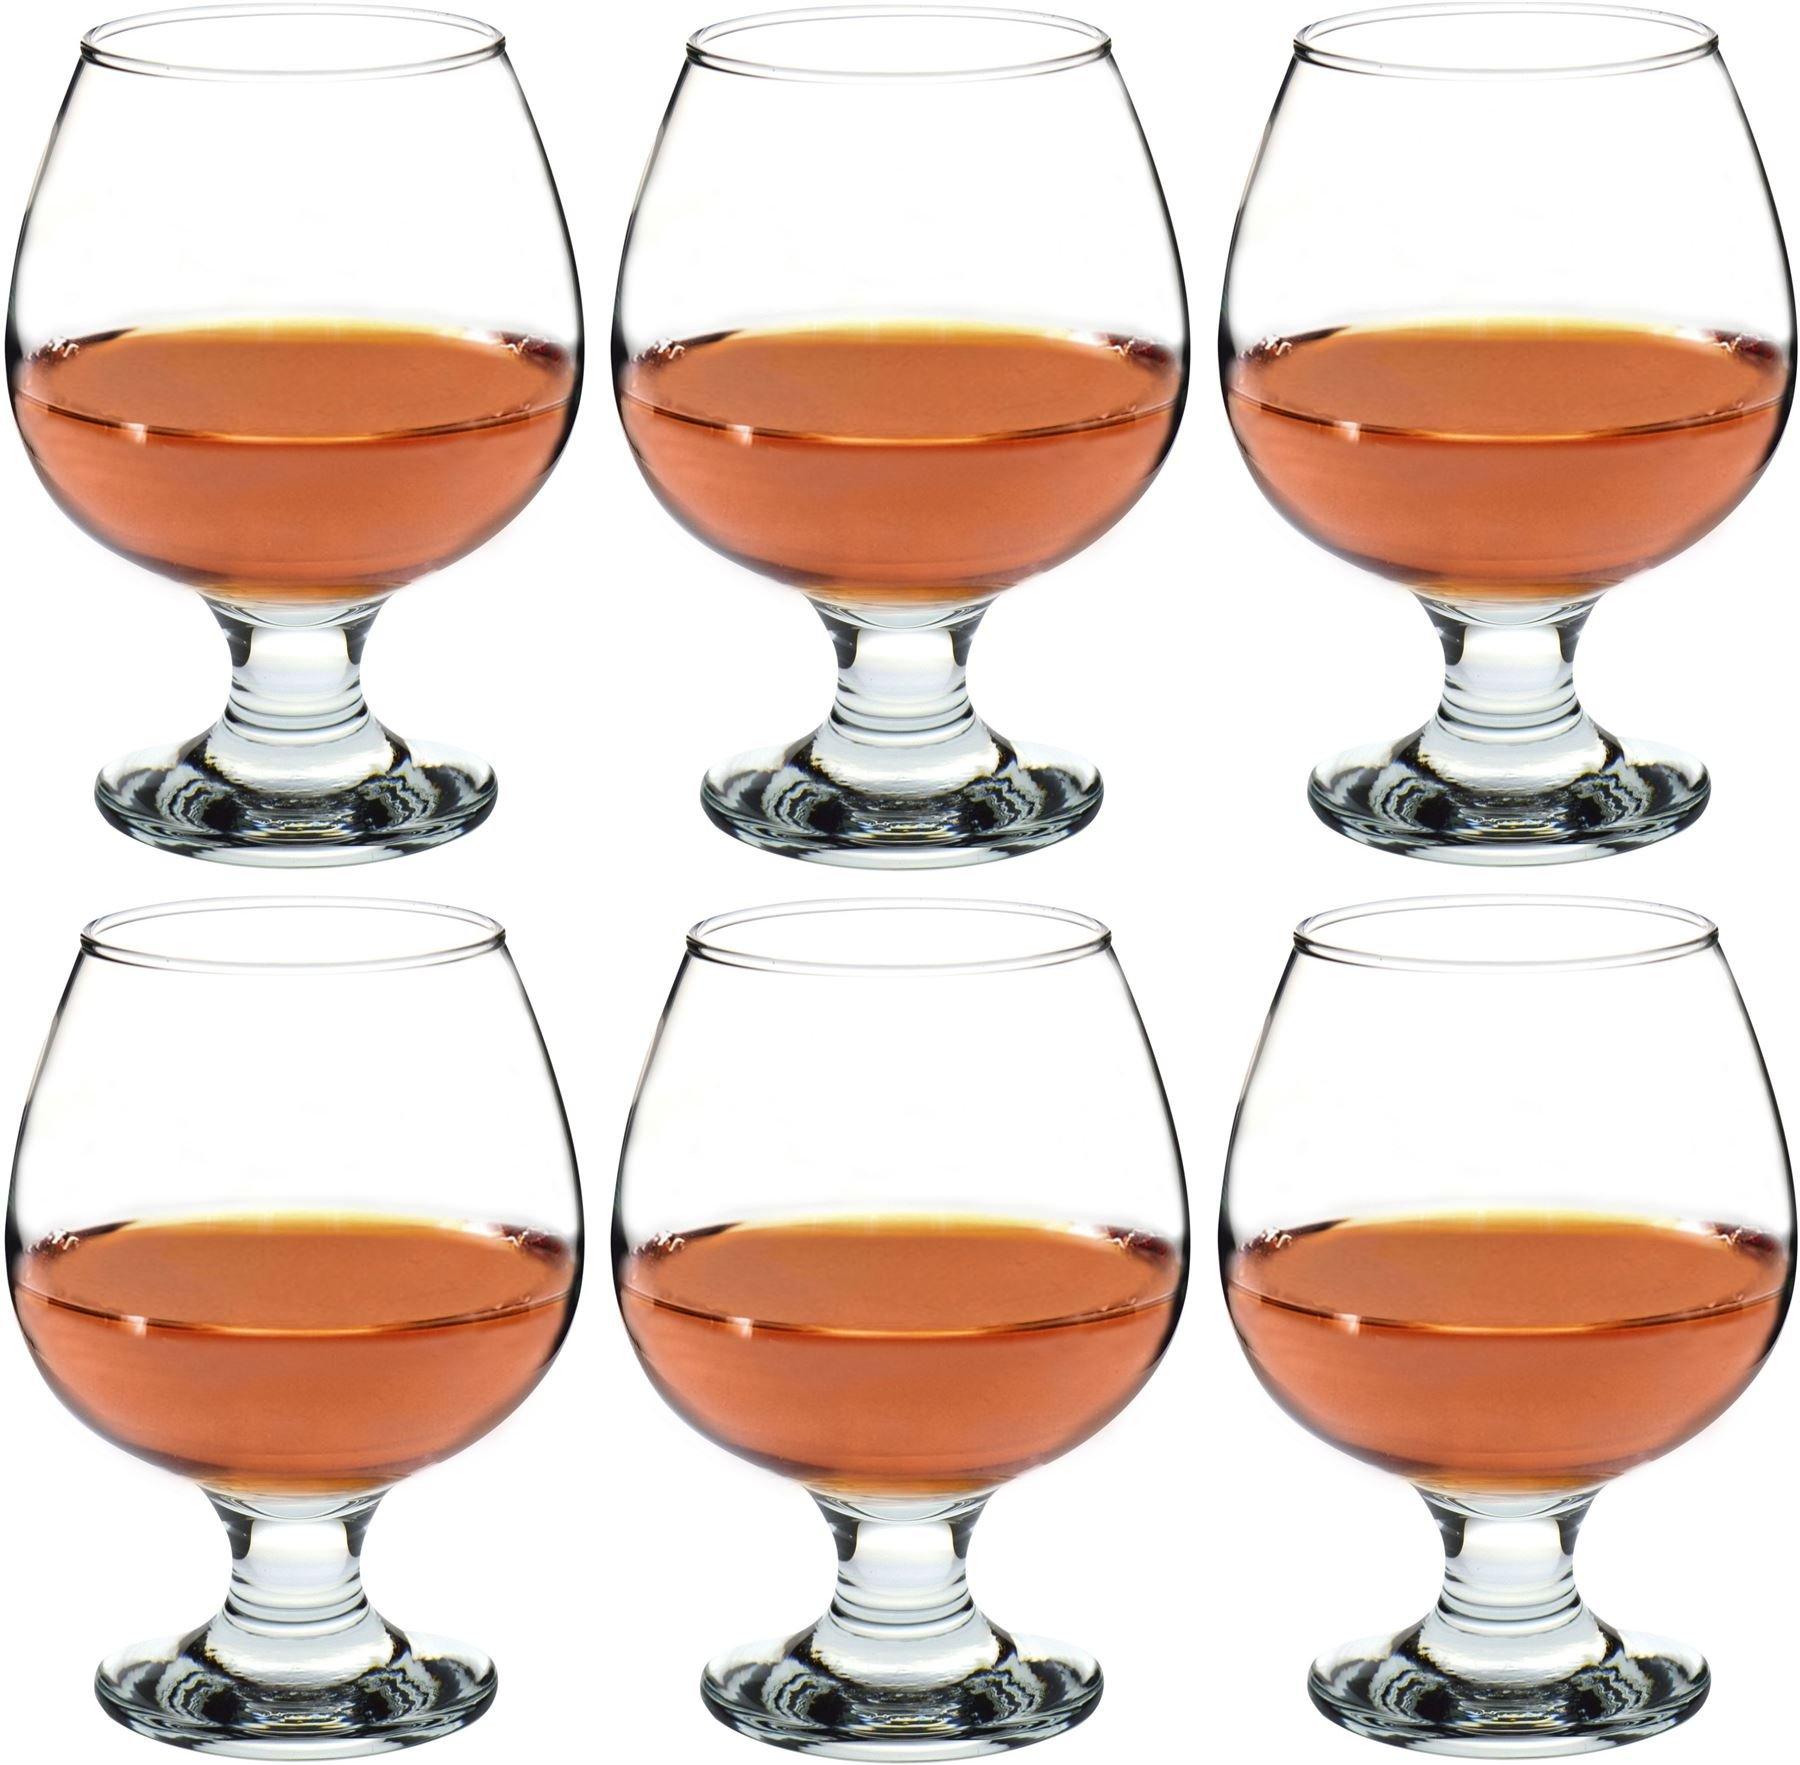 Argon Tableware Brandy/Cognac Snifter Glasses - 390ml (13.7oz) - Pack of 6 Glasses by Argon Tableware